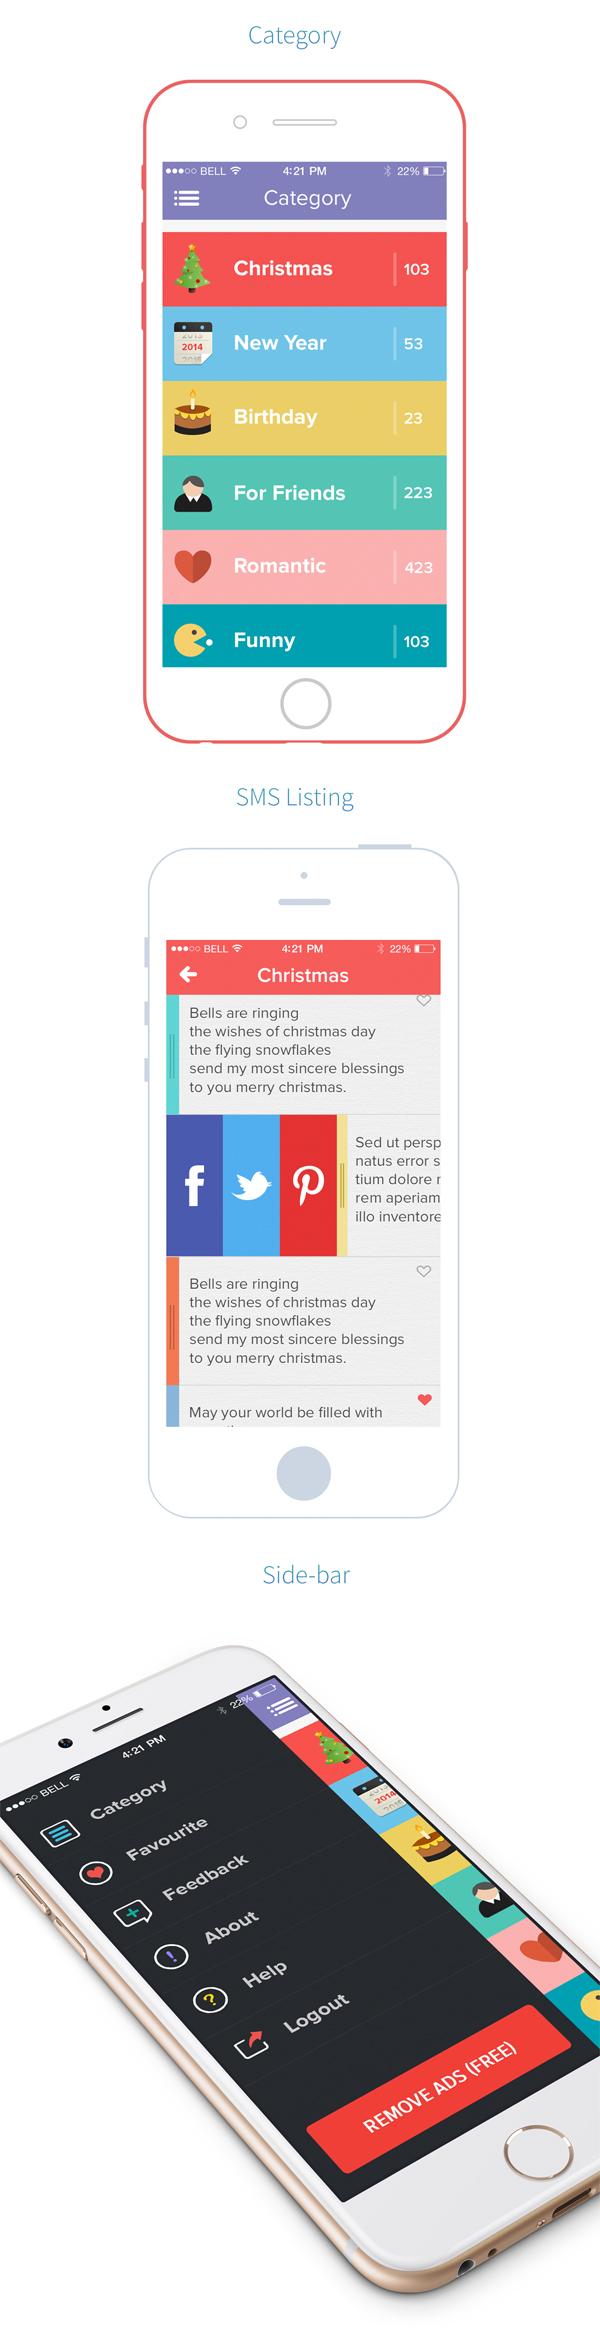 Gretting SMS IOS App by Naoshad Alam